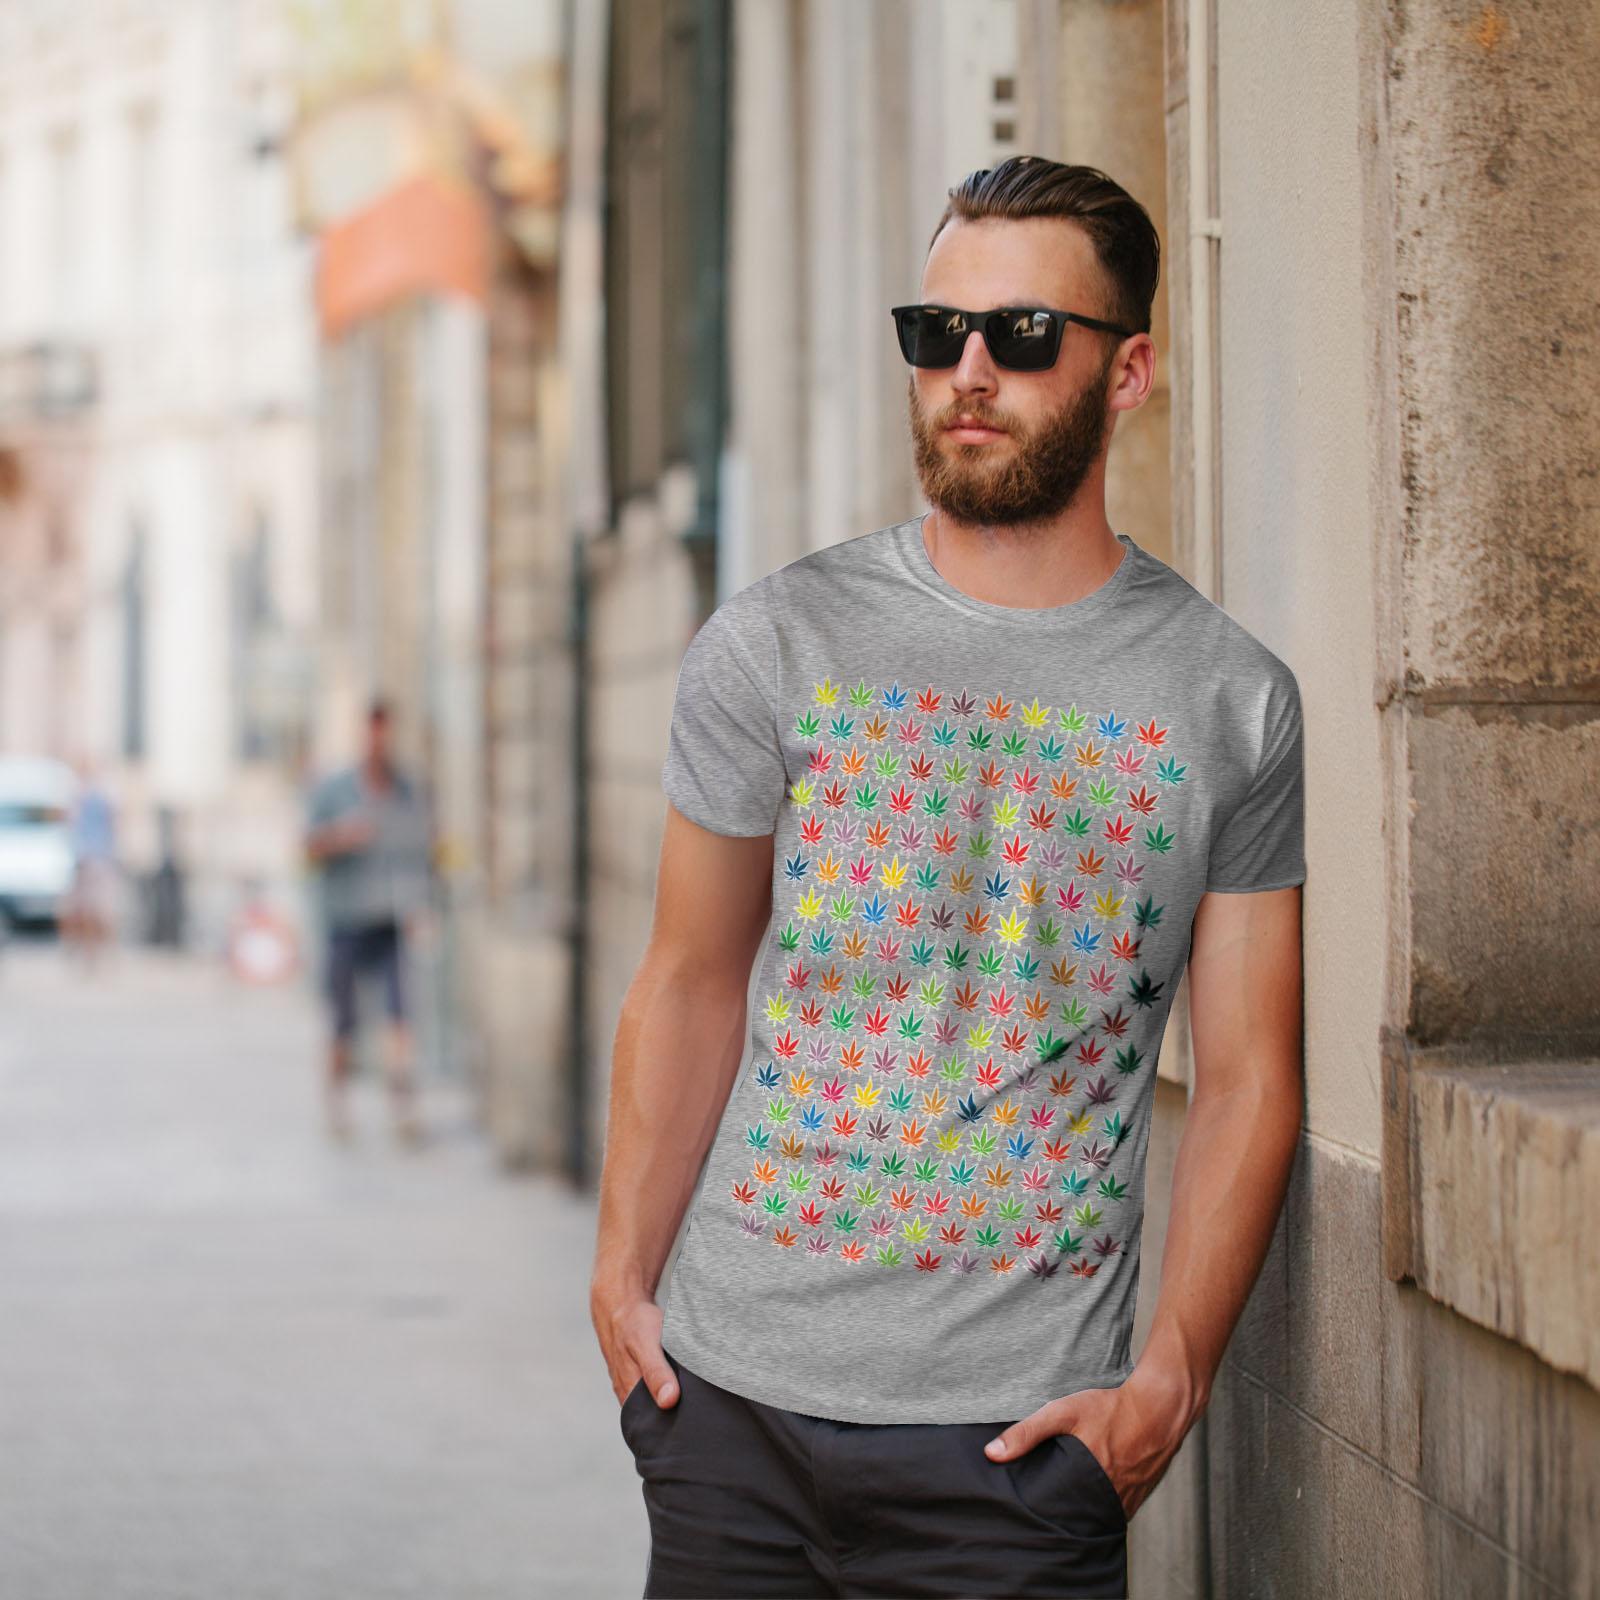 Wellcoda Marijuana Weed Leaf Mens T-shirt Rainbow Graphic Design Printed Tee